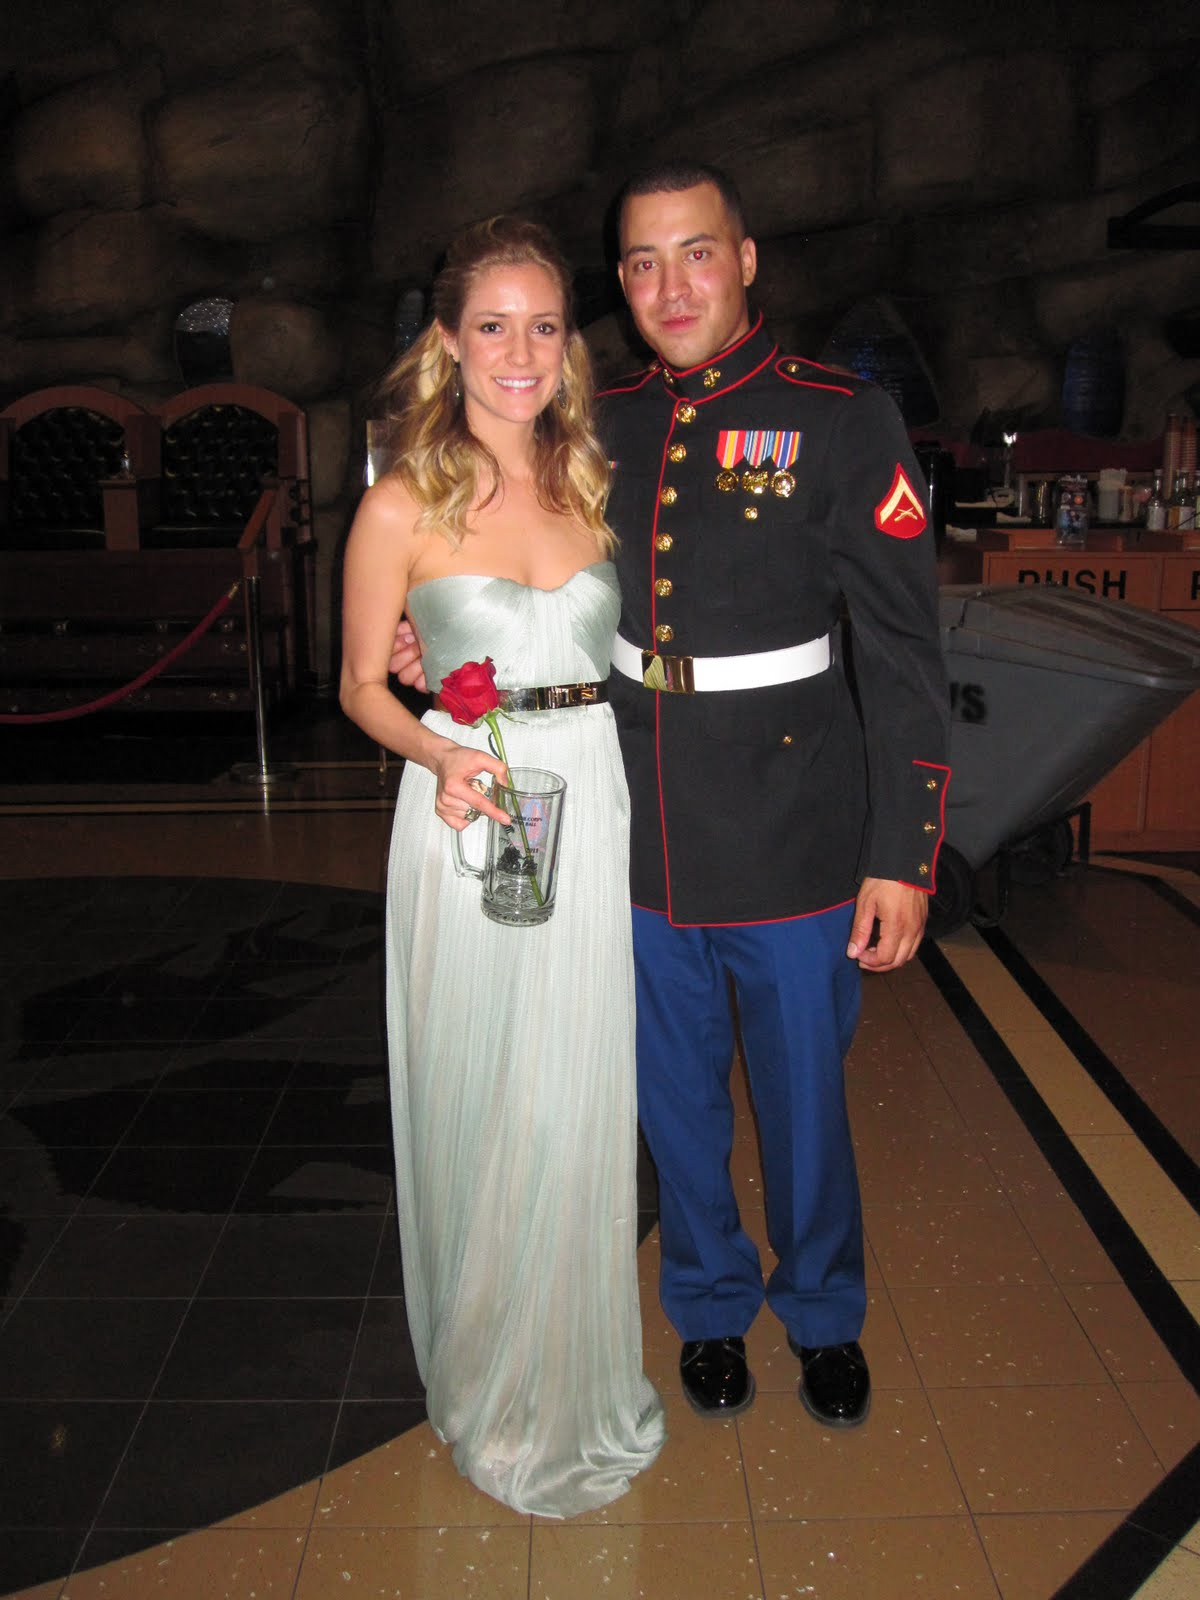 Hills Freak: Kristin Cavallari: Belle Of The Marine Corps Ball